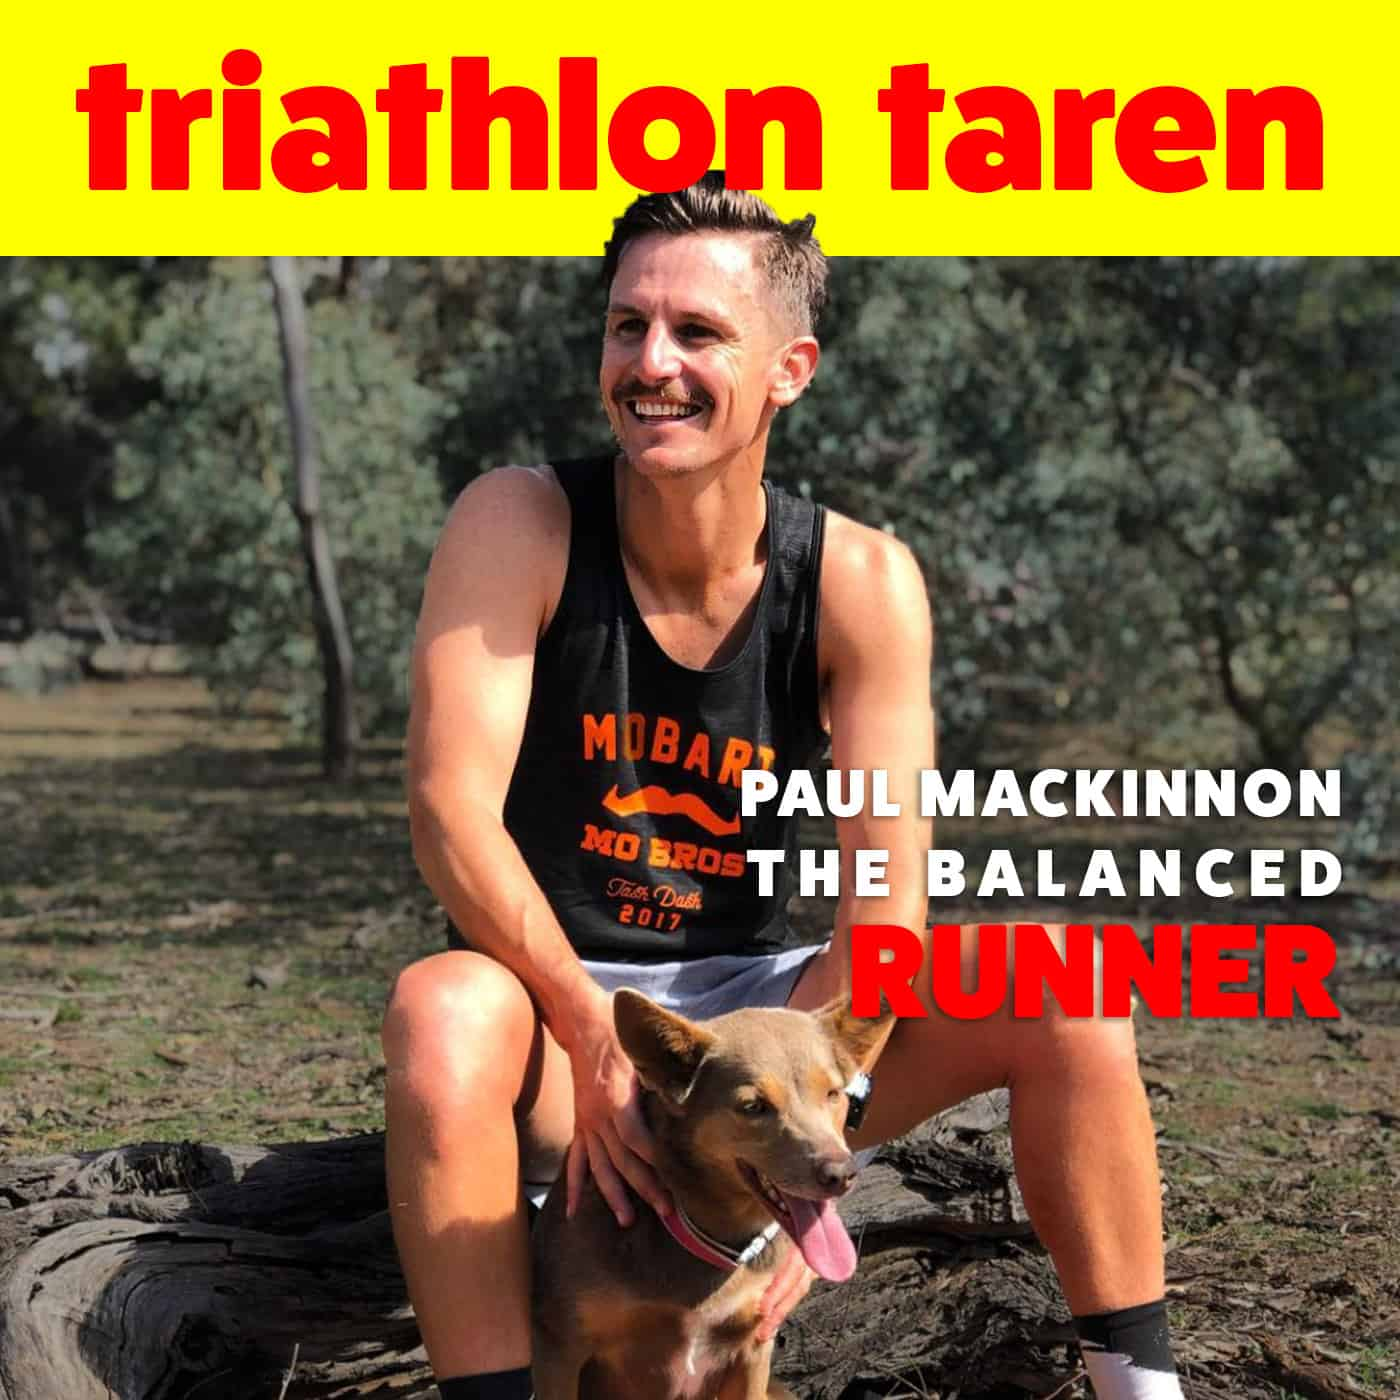 Get Faster On The Run   The Balanced Runner, Paul MacKinnon